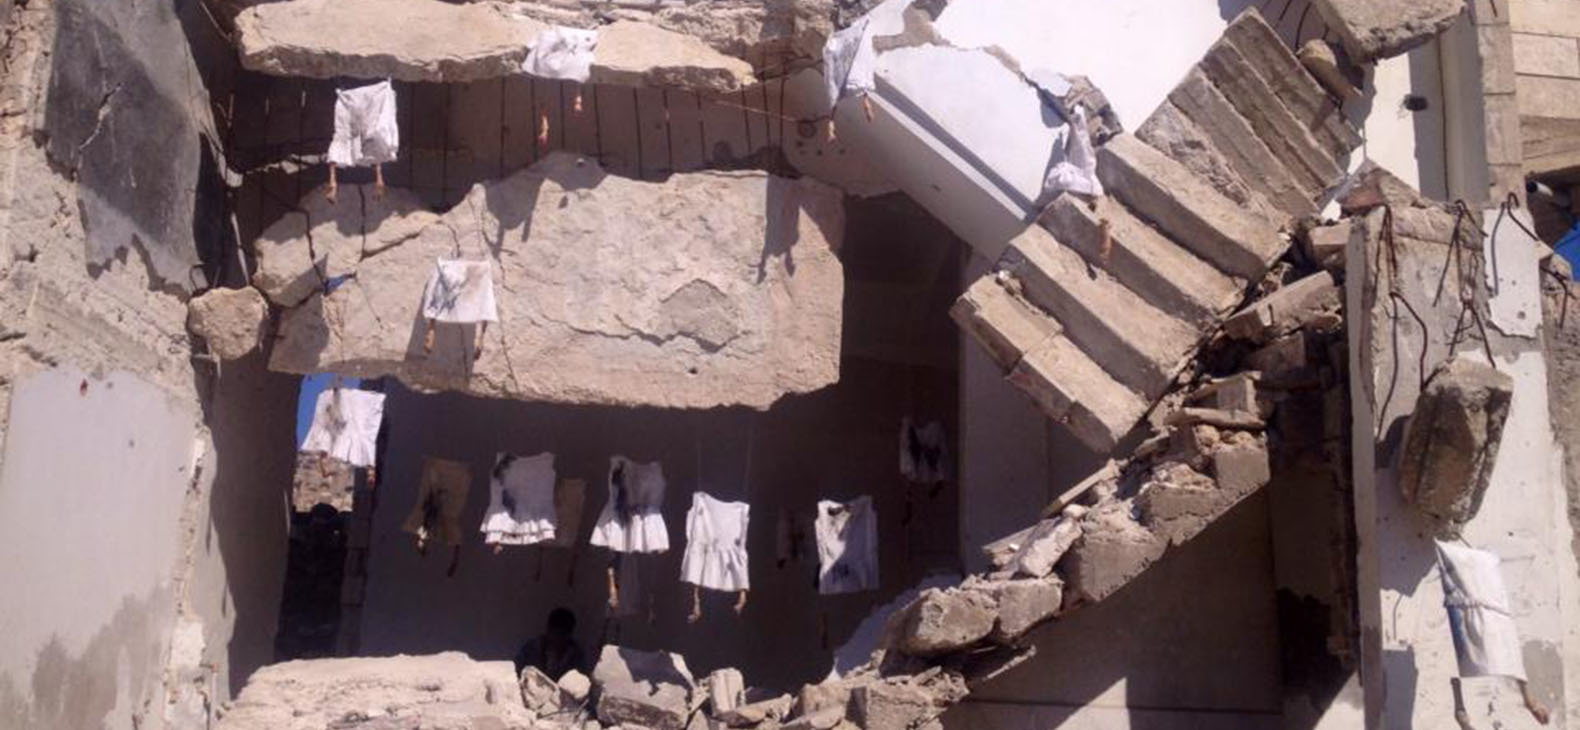 Schafhof Transfer Syrien - Hiba Alansare: Fegefeuer